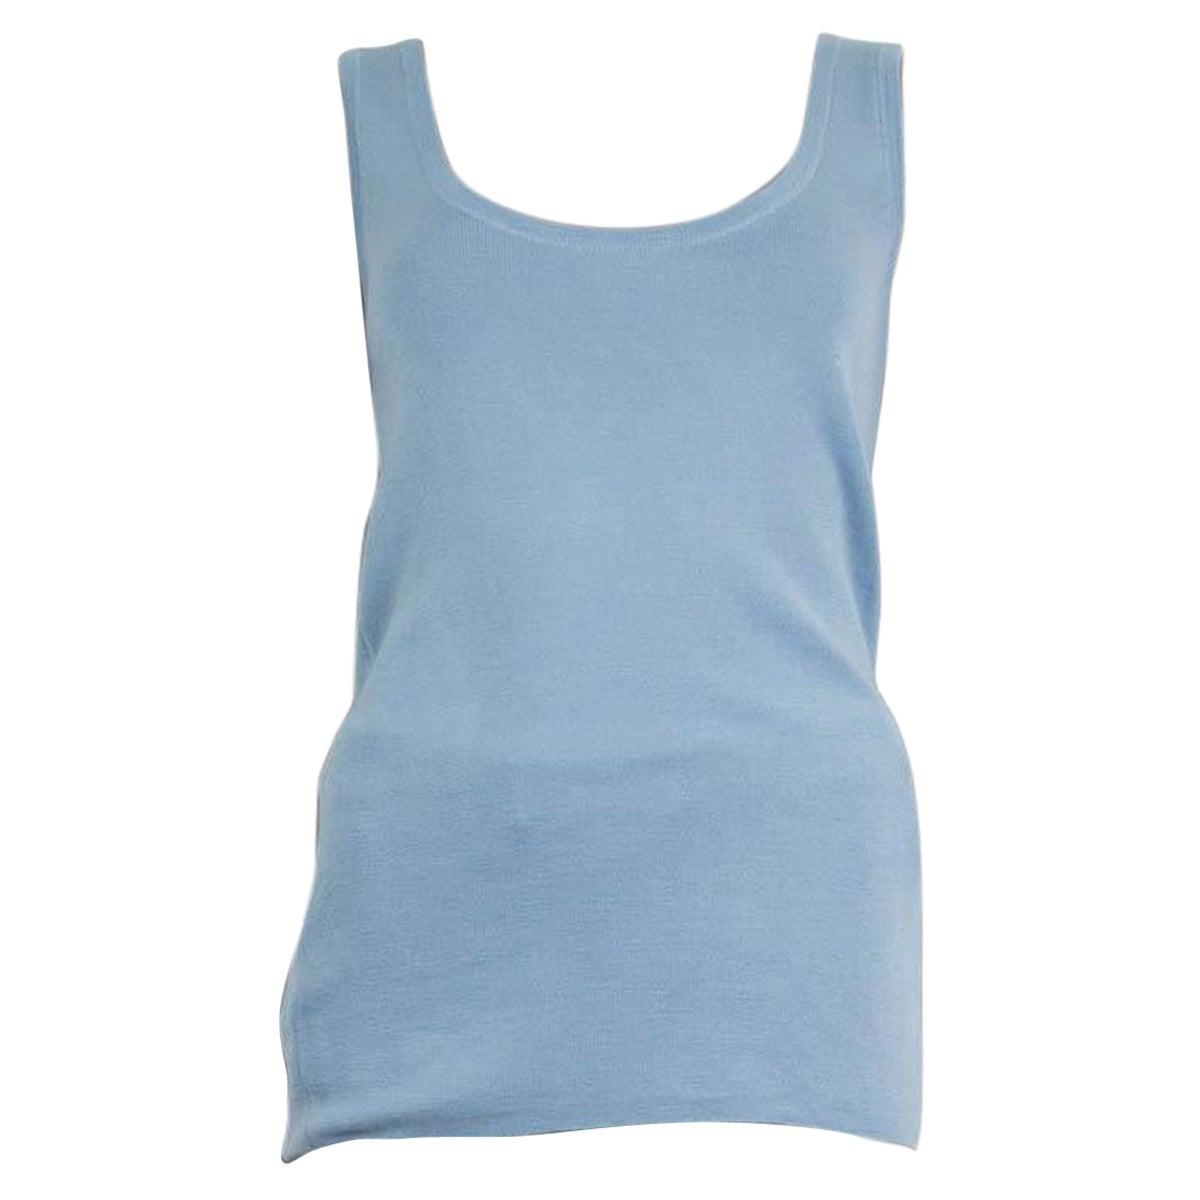 PRADA light blue cashmere silk Sleeveless Sweater 48 XXL